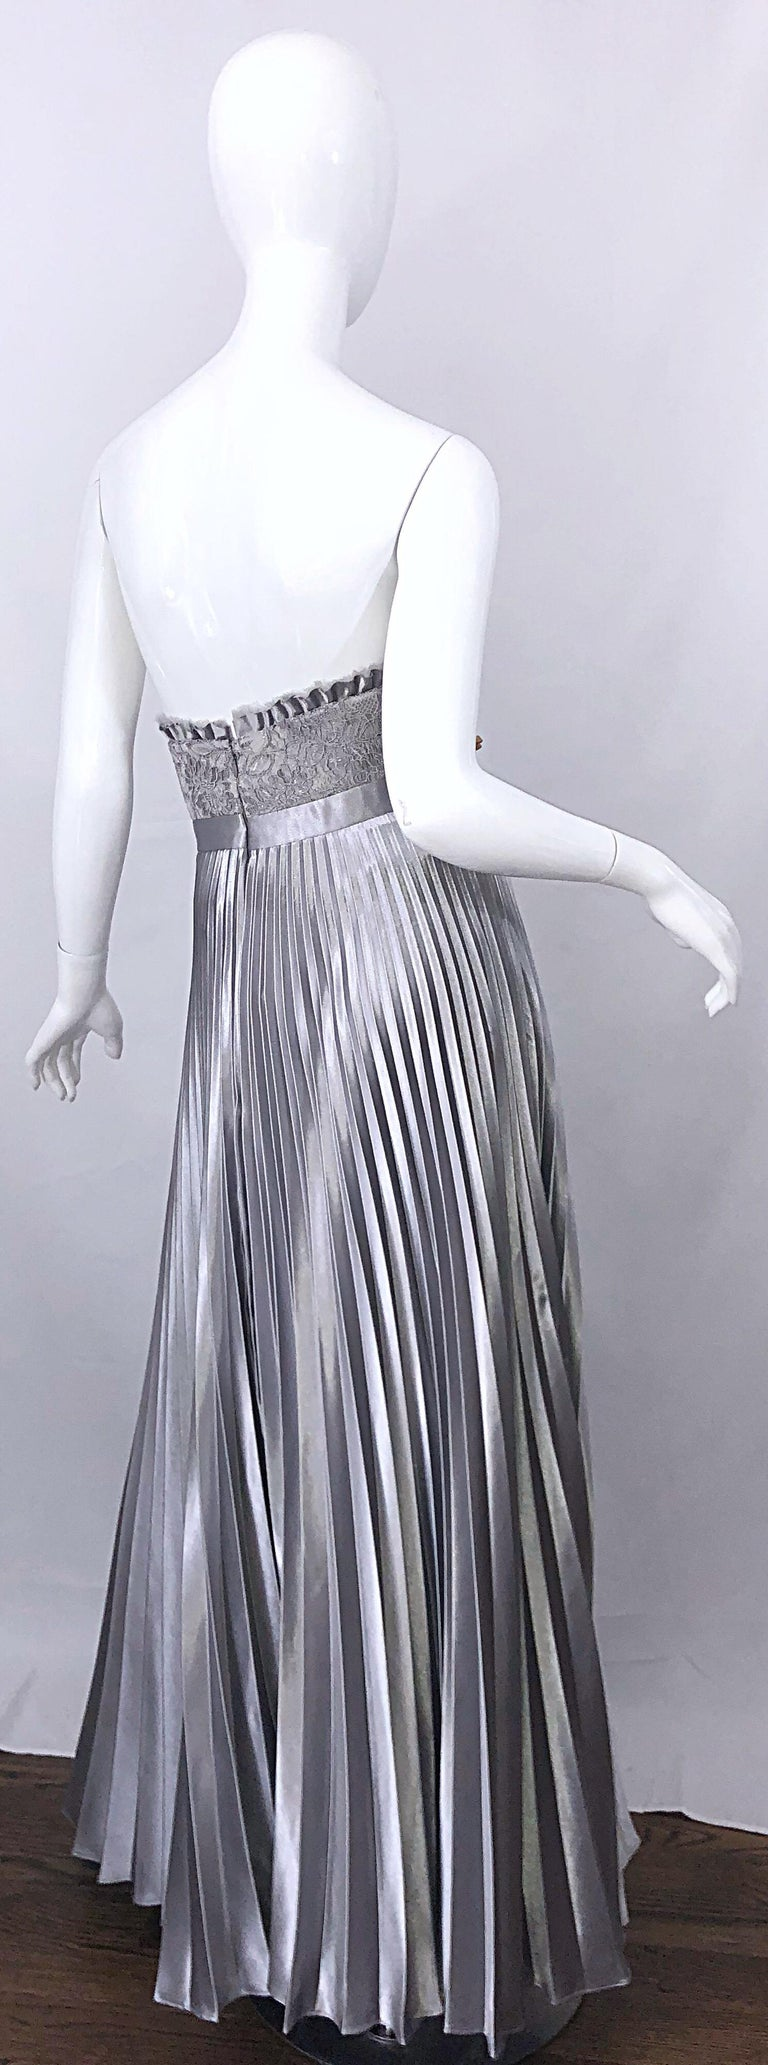 Beautiful Vintage Badgley Mischka Size 10 / 12 Silver Metallic Beaded Gown Dress For Sale 4